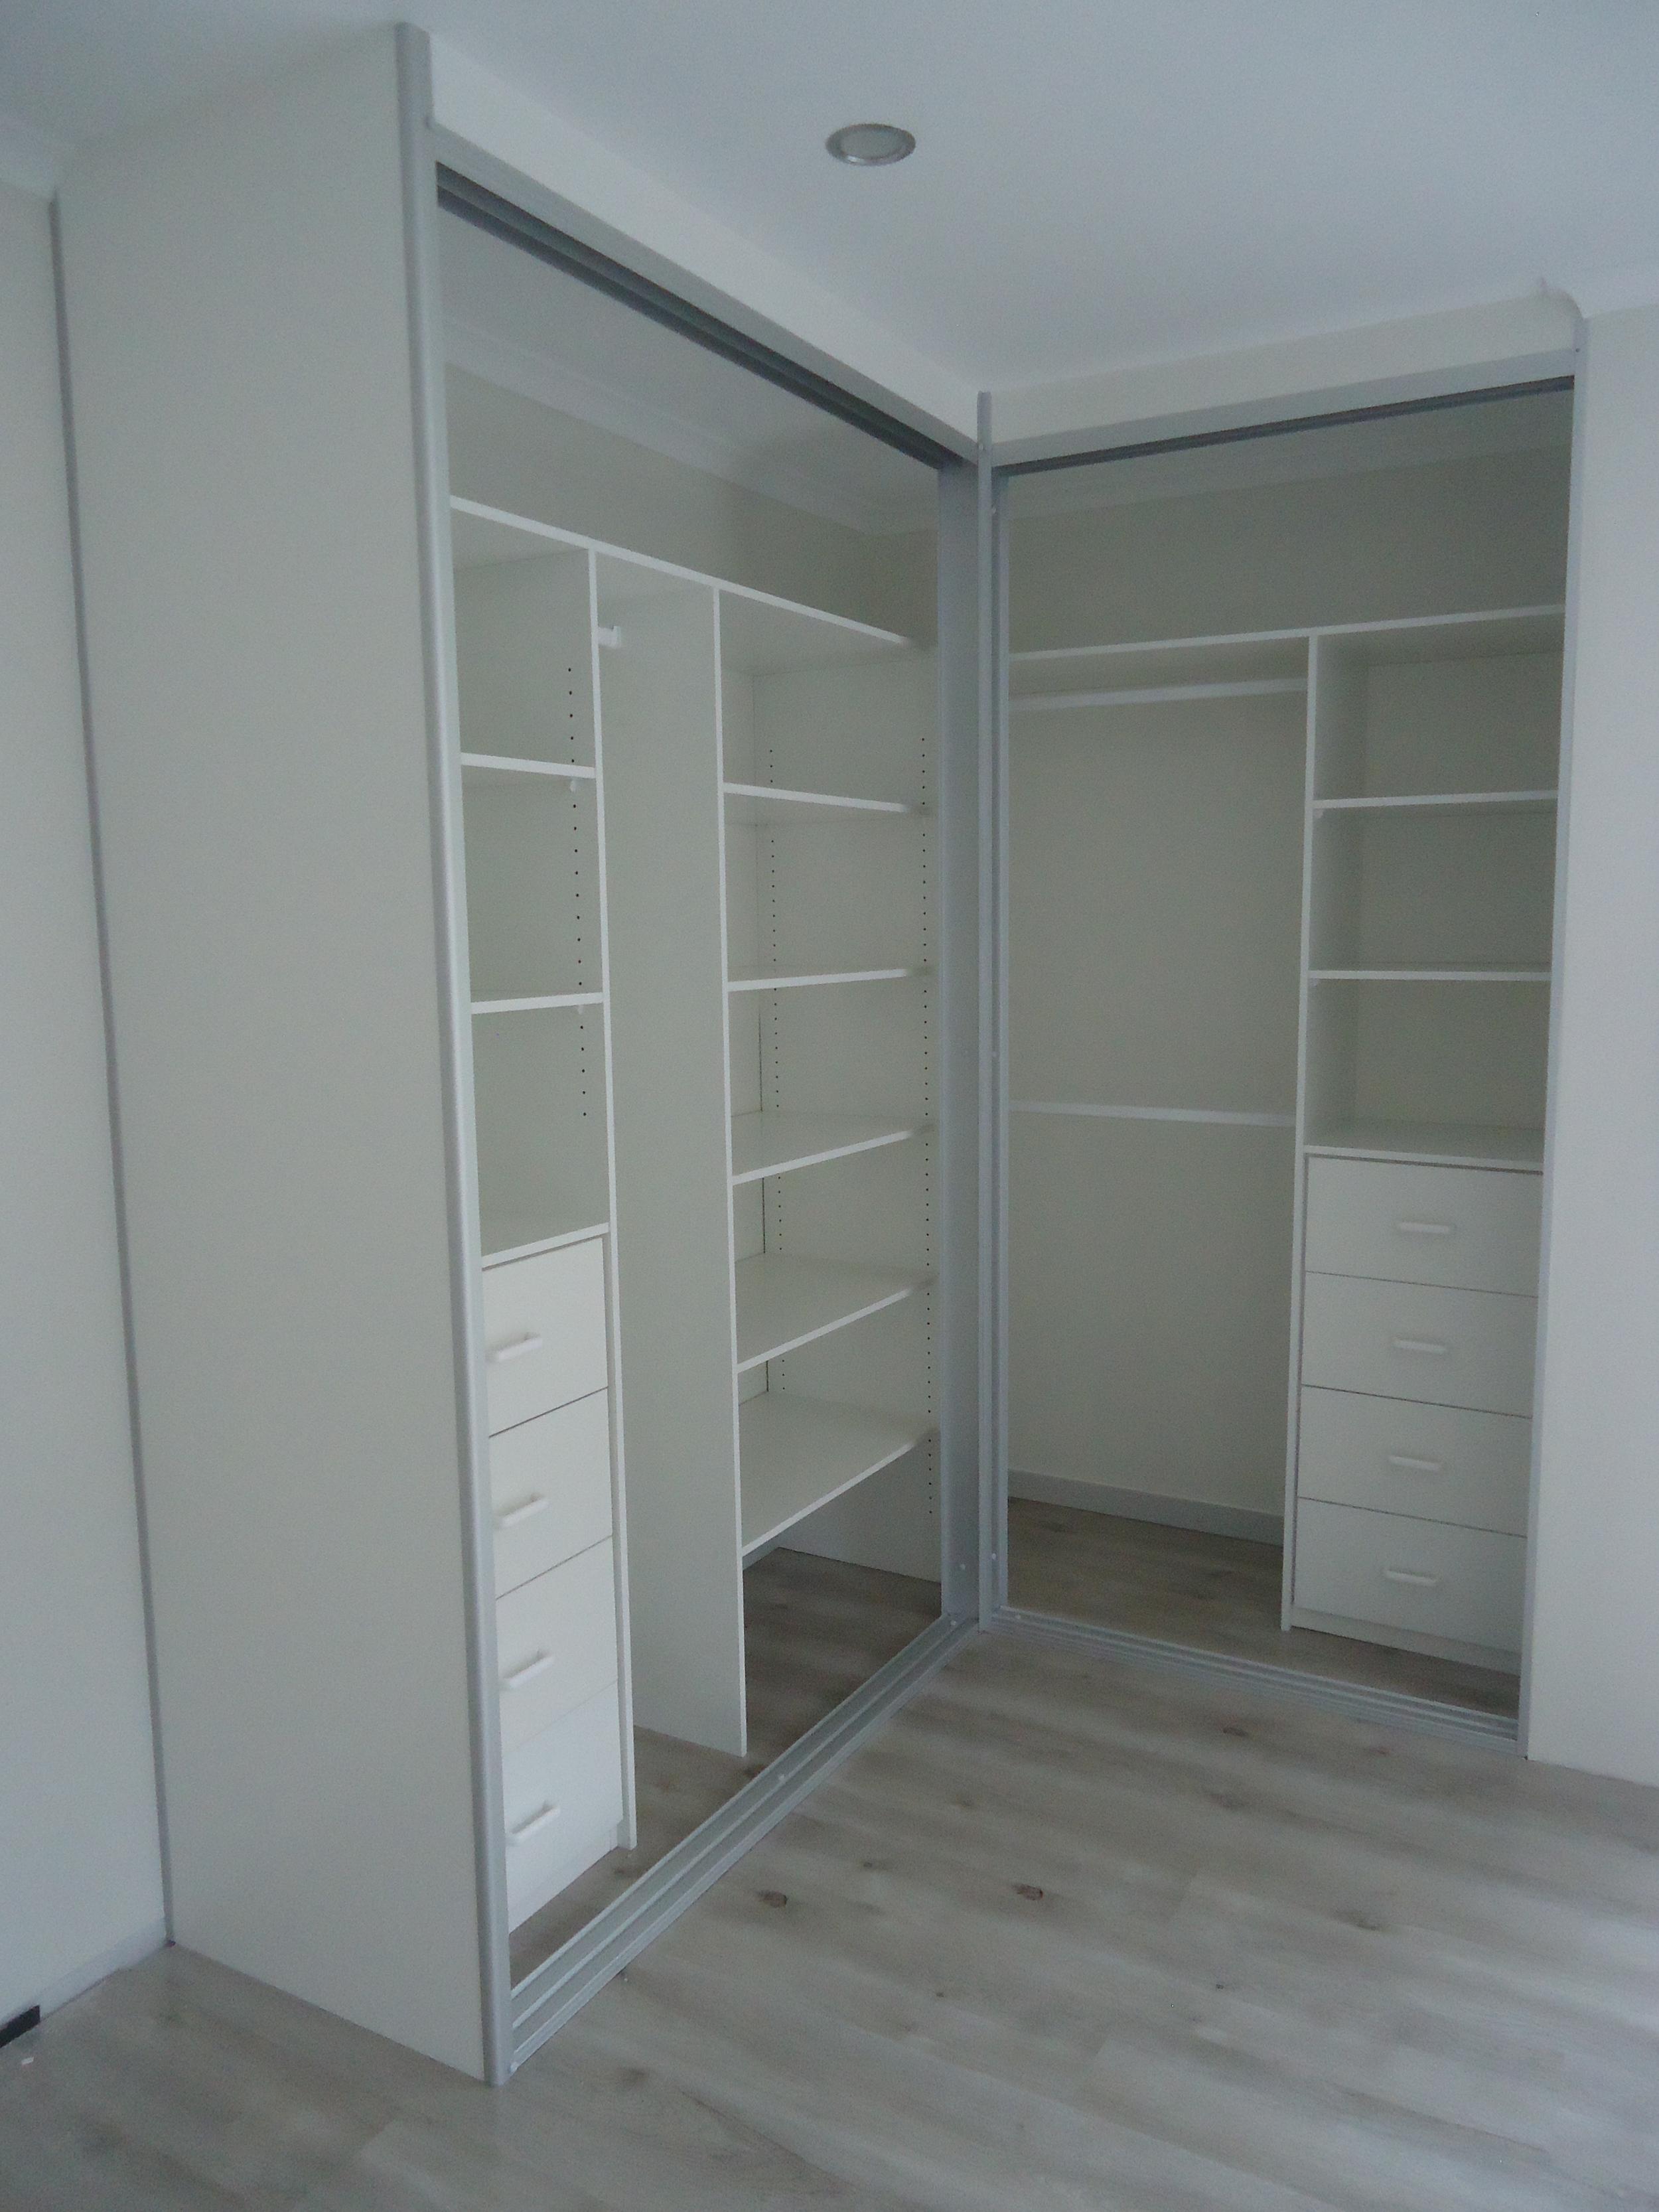 corner wardrobe internals.JPG